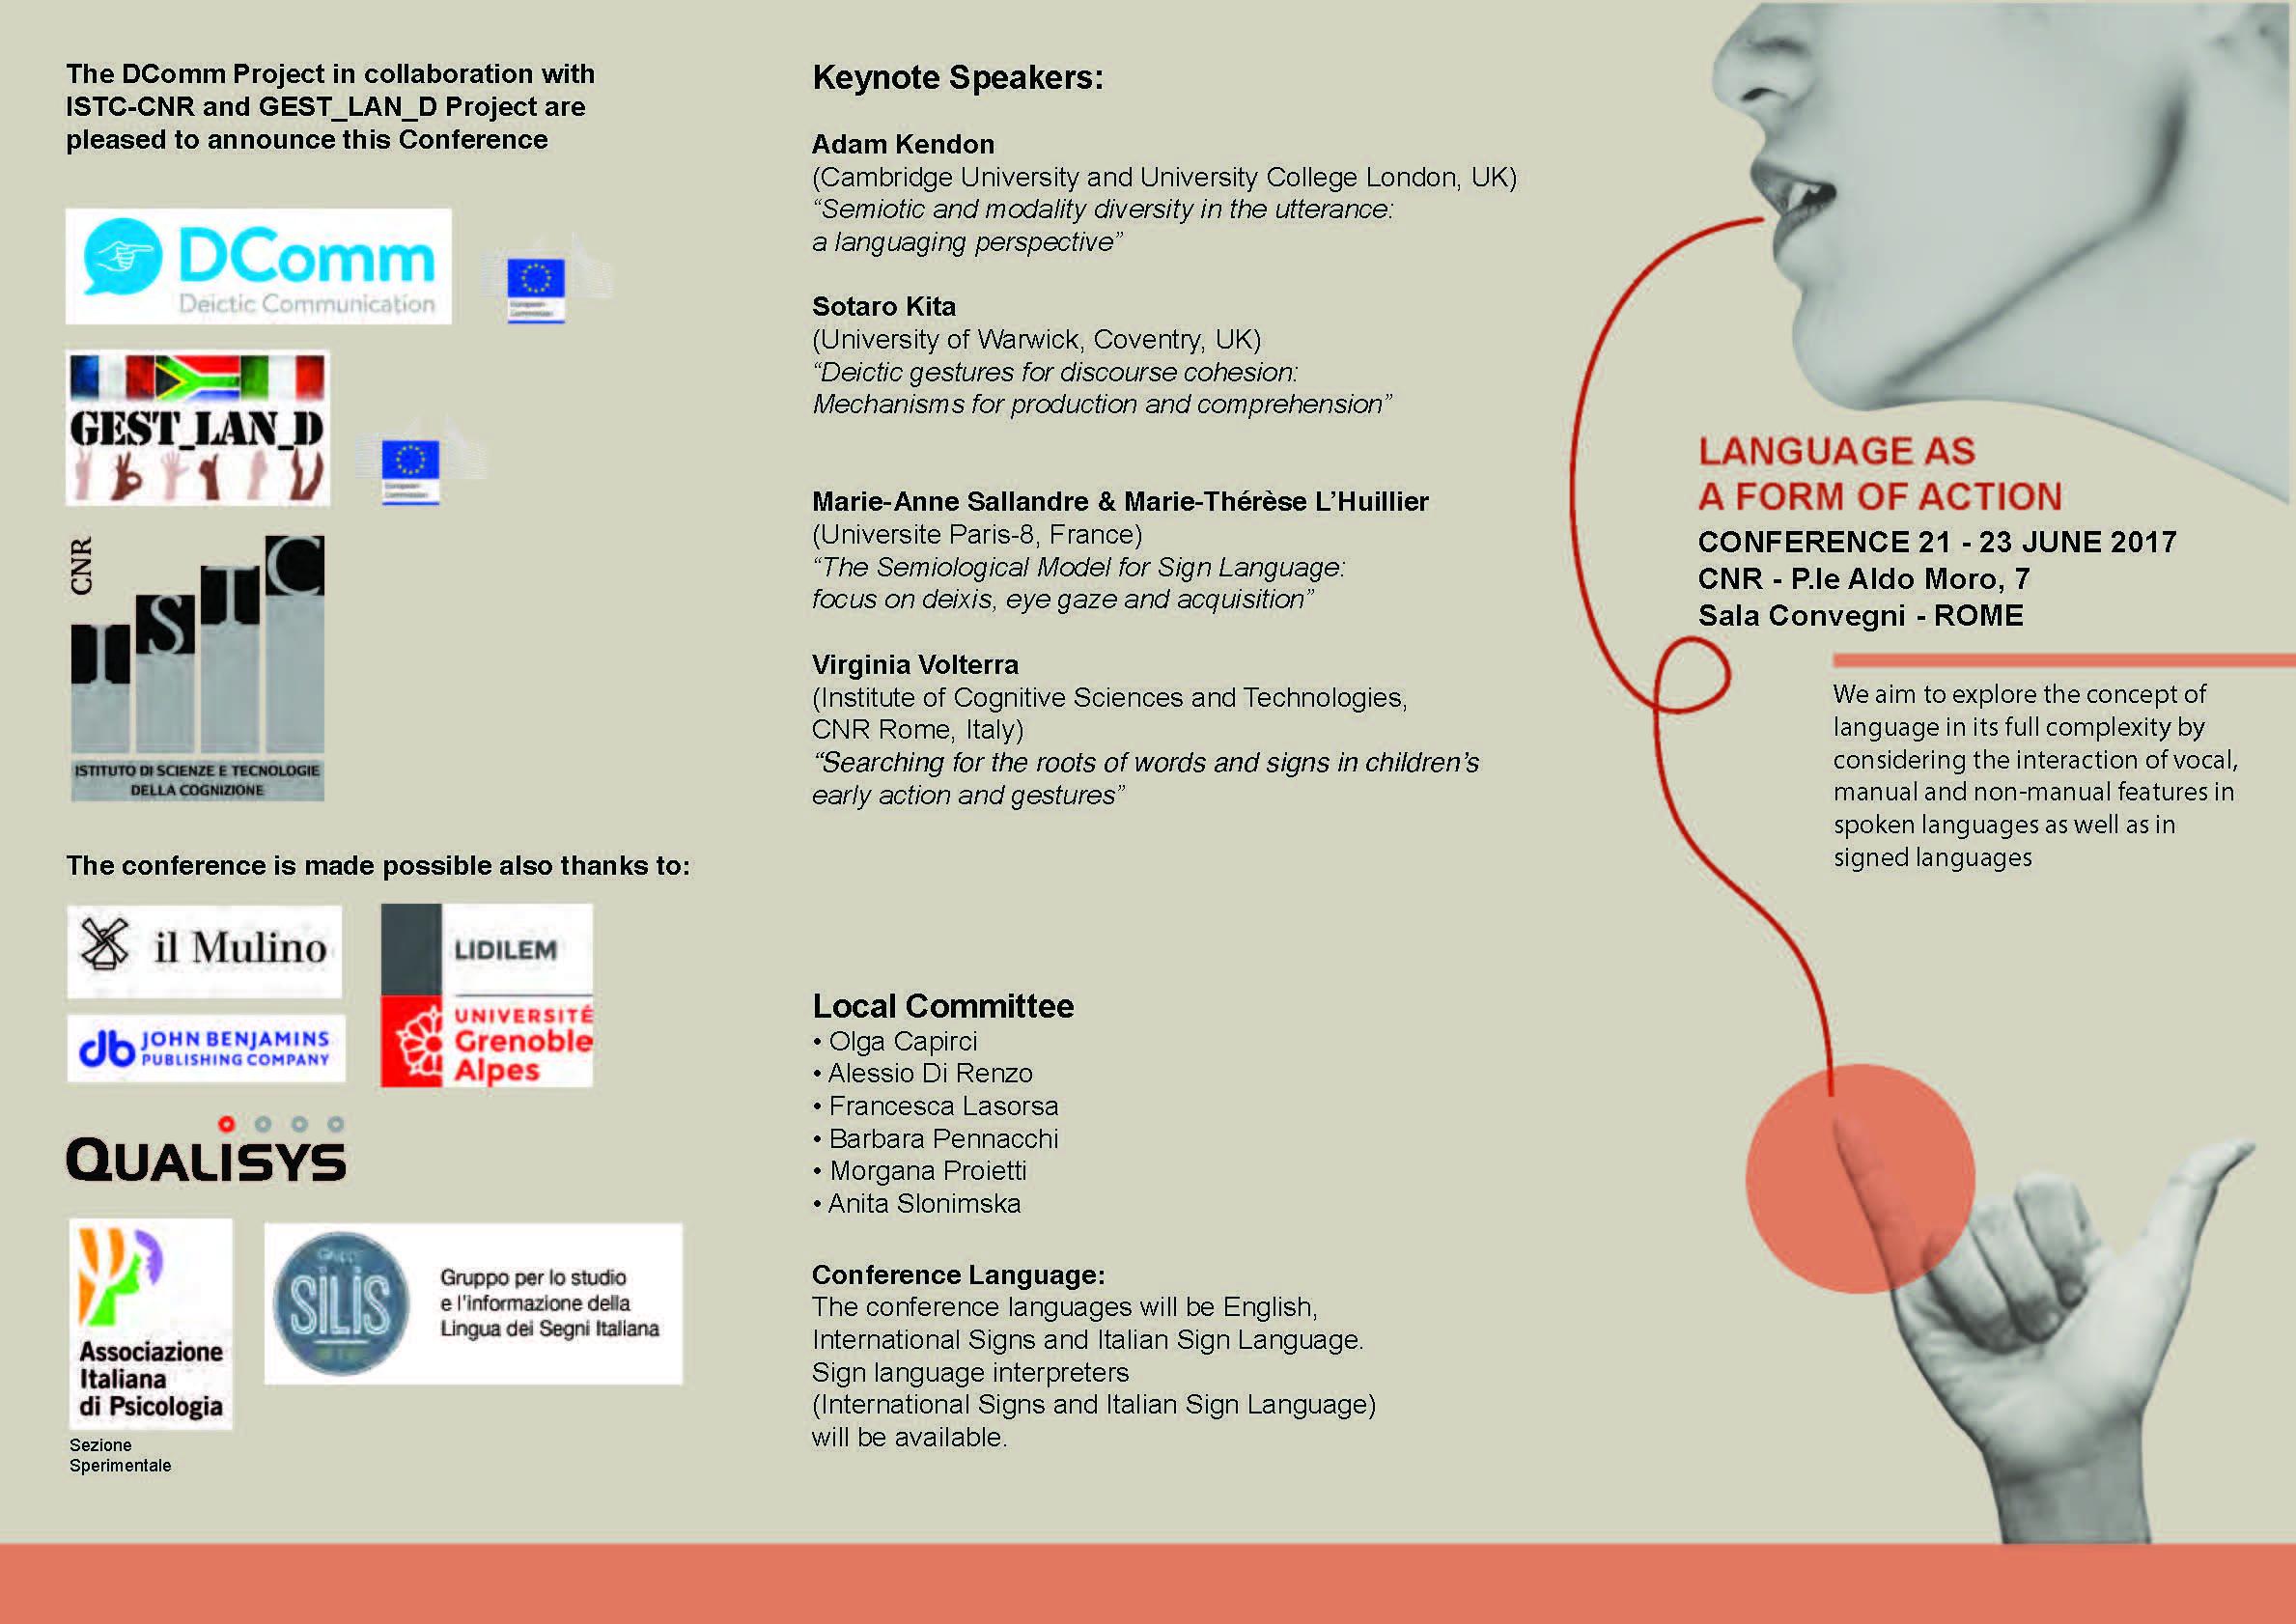 ISTC-CNR-Brochure-Conferenza-Language-as-a-form-of-action-ilovepdf-compressed2_Pagina_1